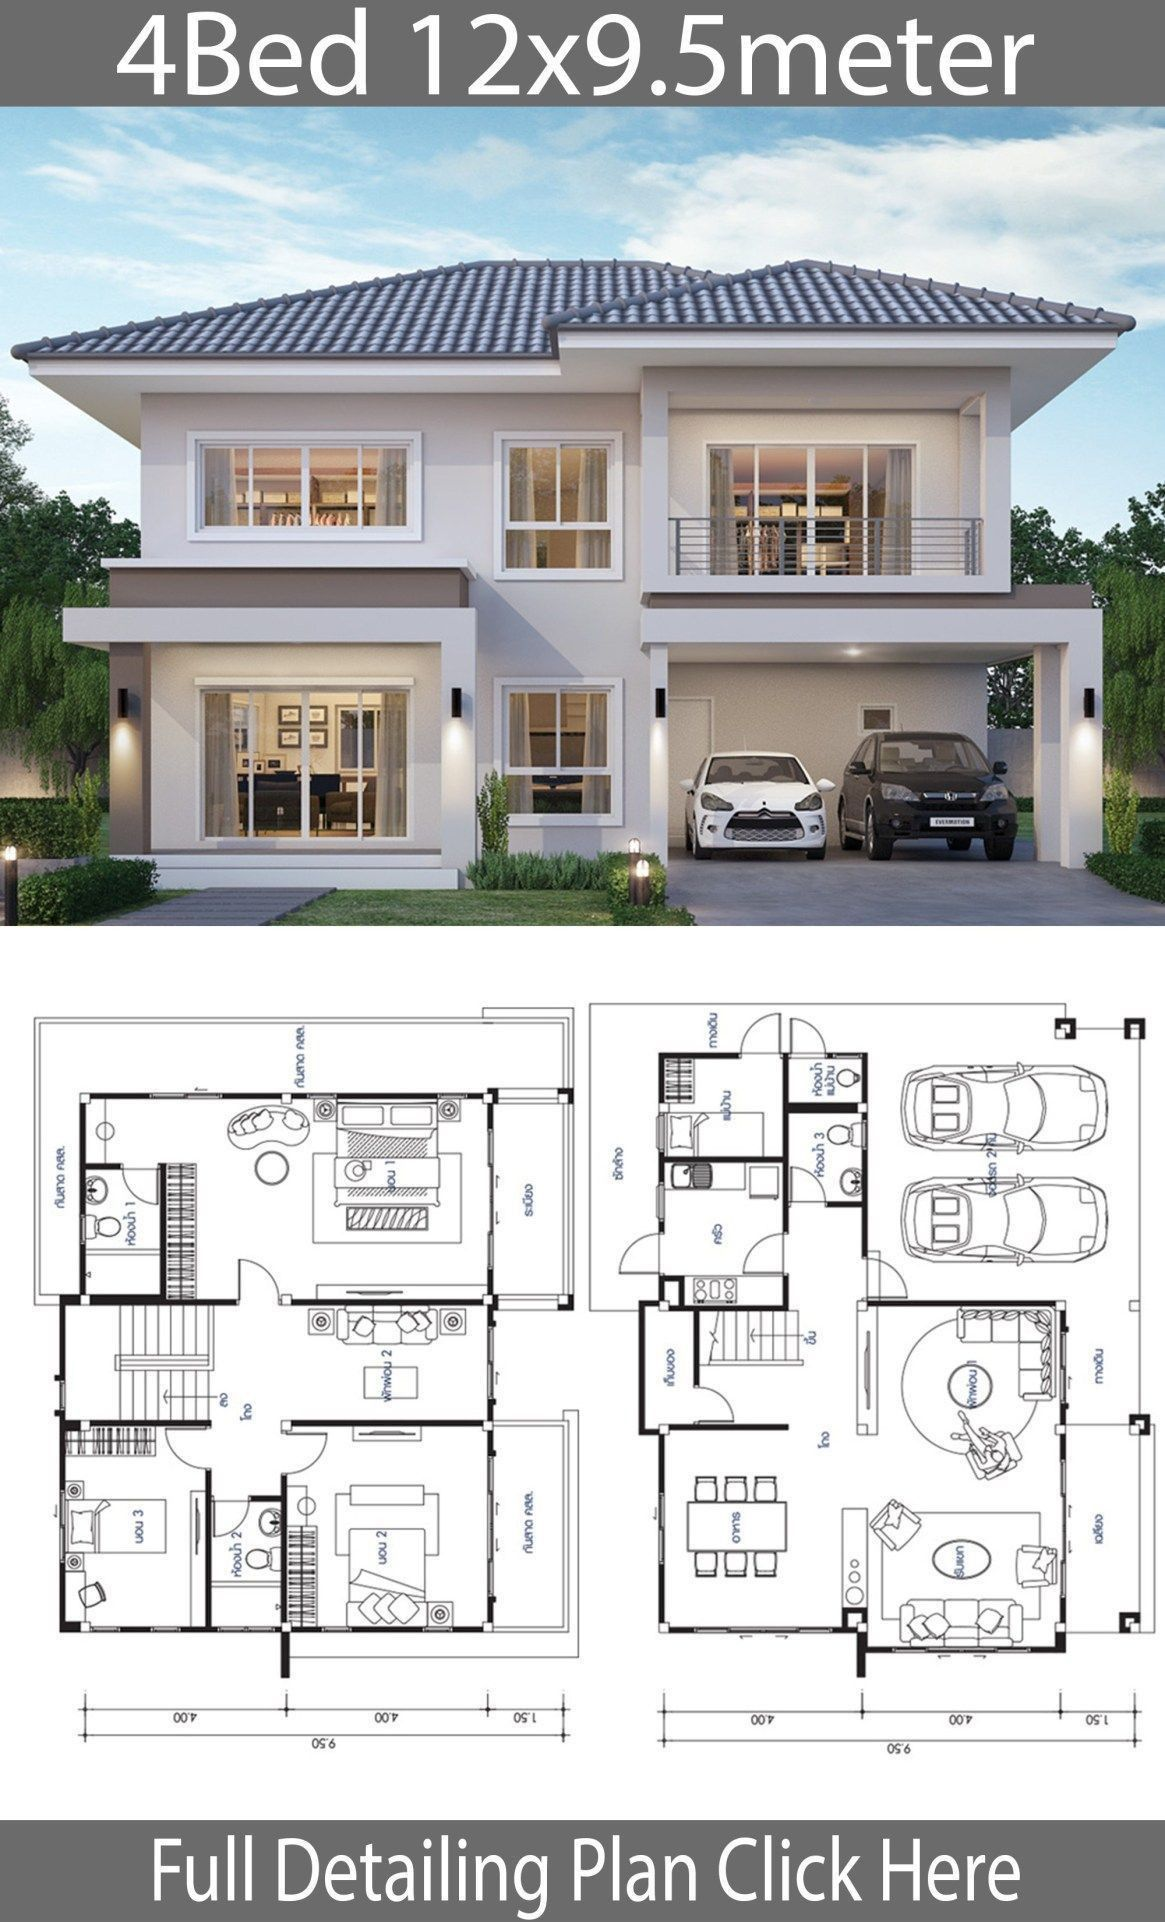 House Design Plan 12 9 5m With 4 Bedrooms Duplex House 2 Storey House Design Architectural House Plans Sims House Plans